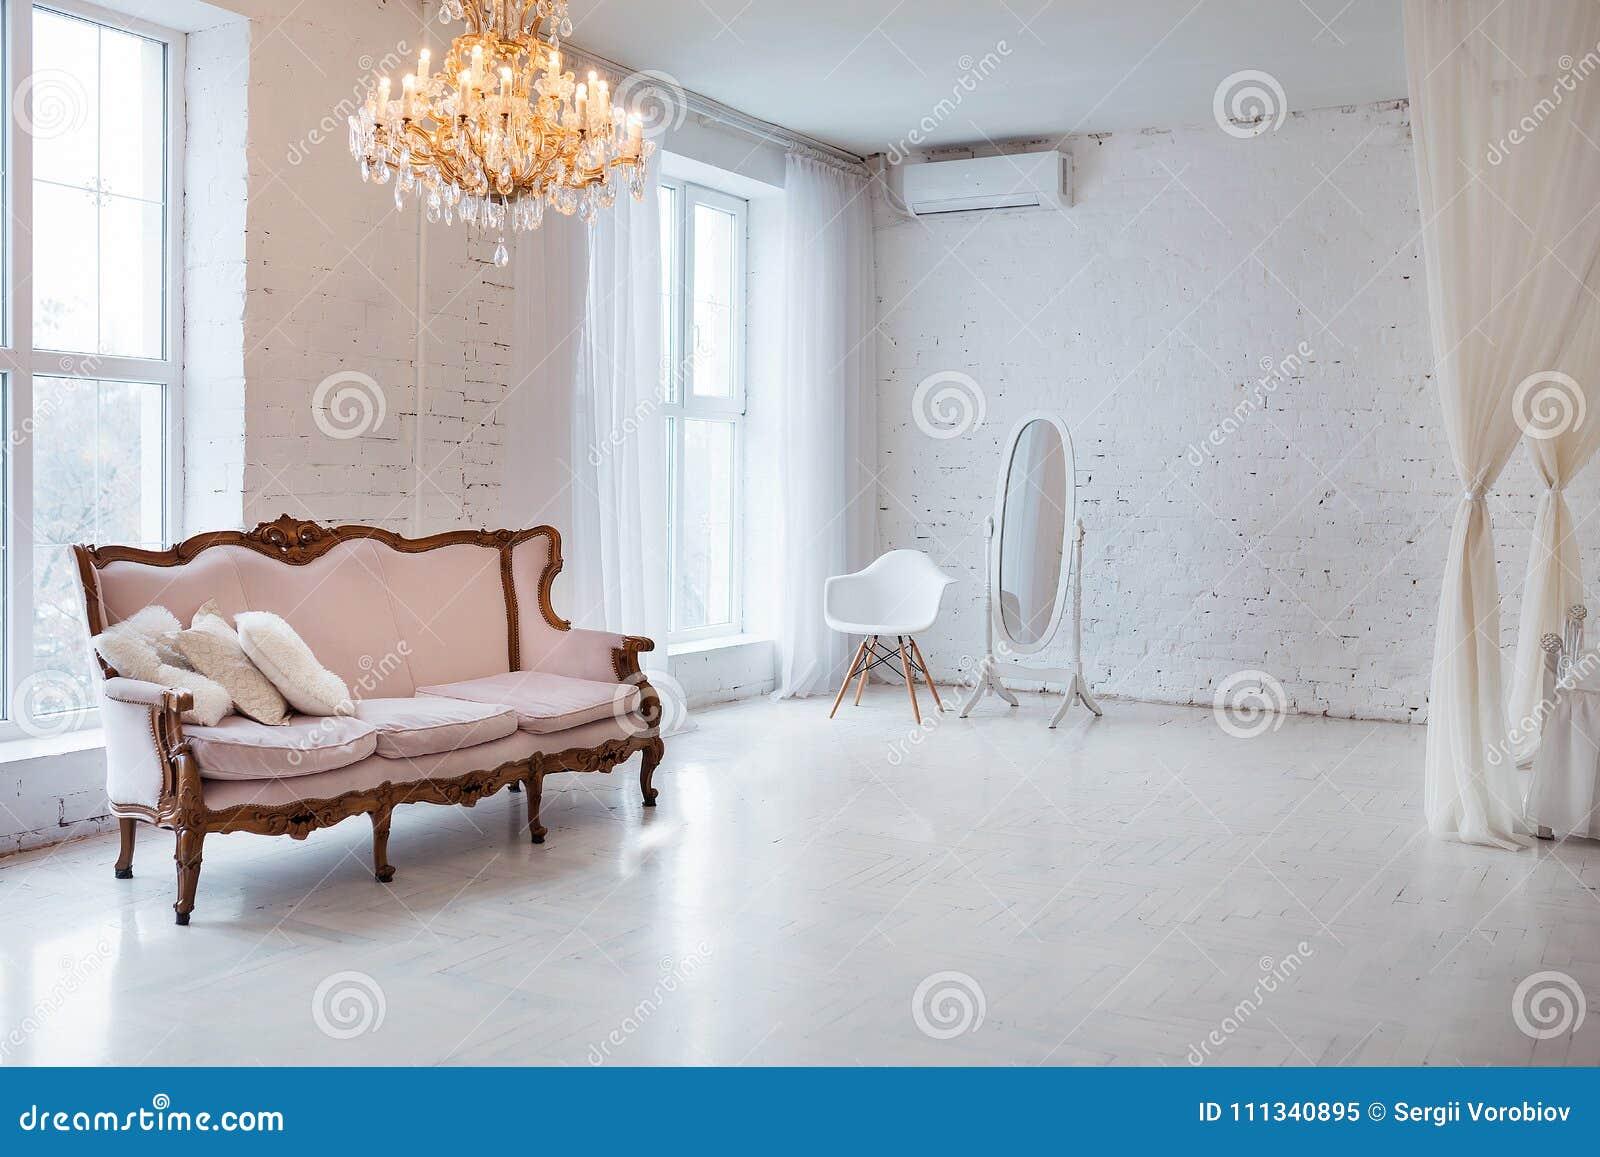 Vintage Style Sofa In Loft Interior Room With Big Window Stock